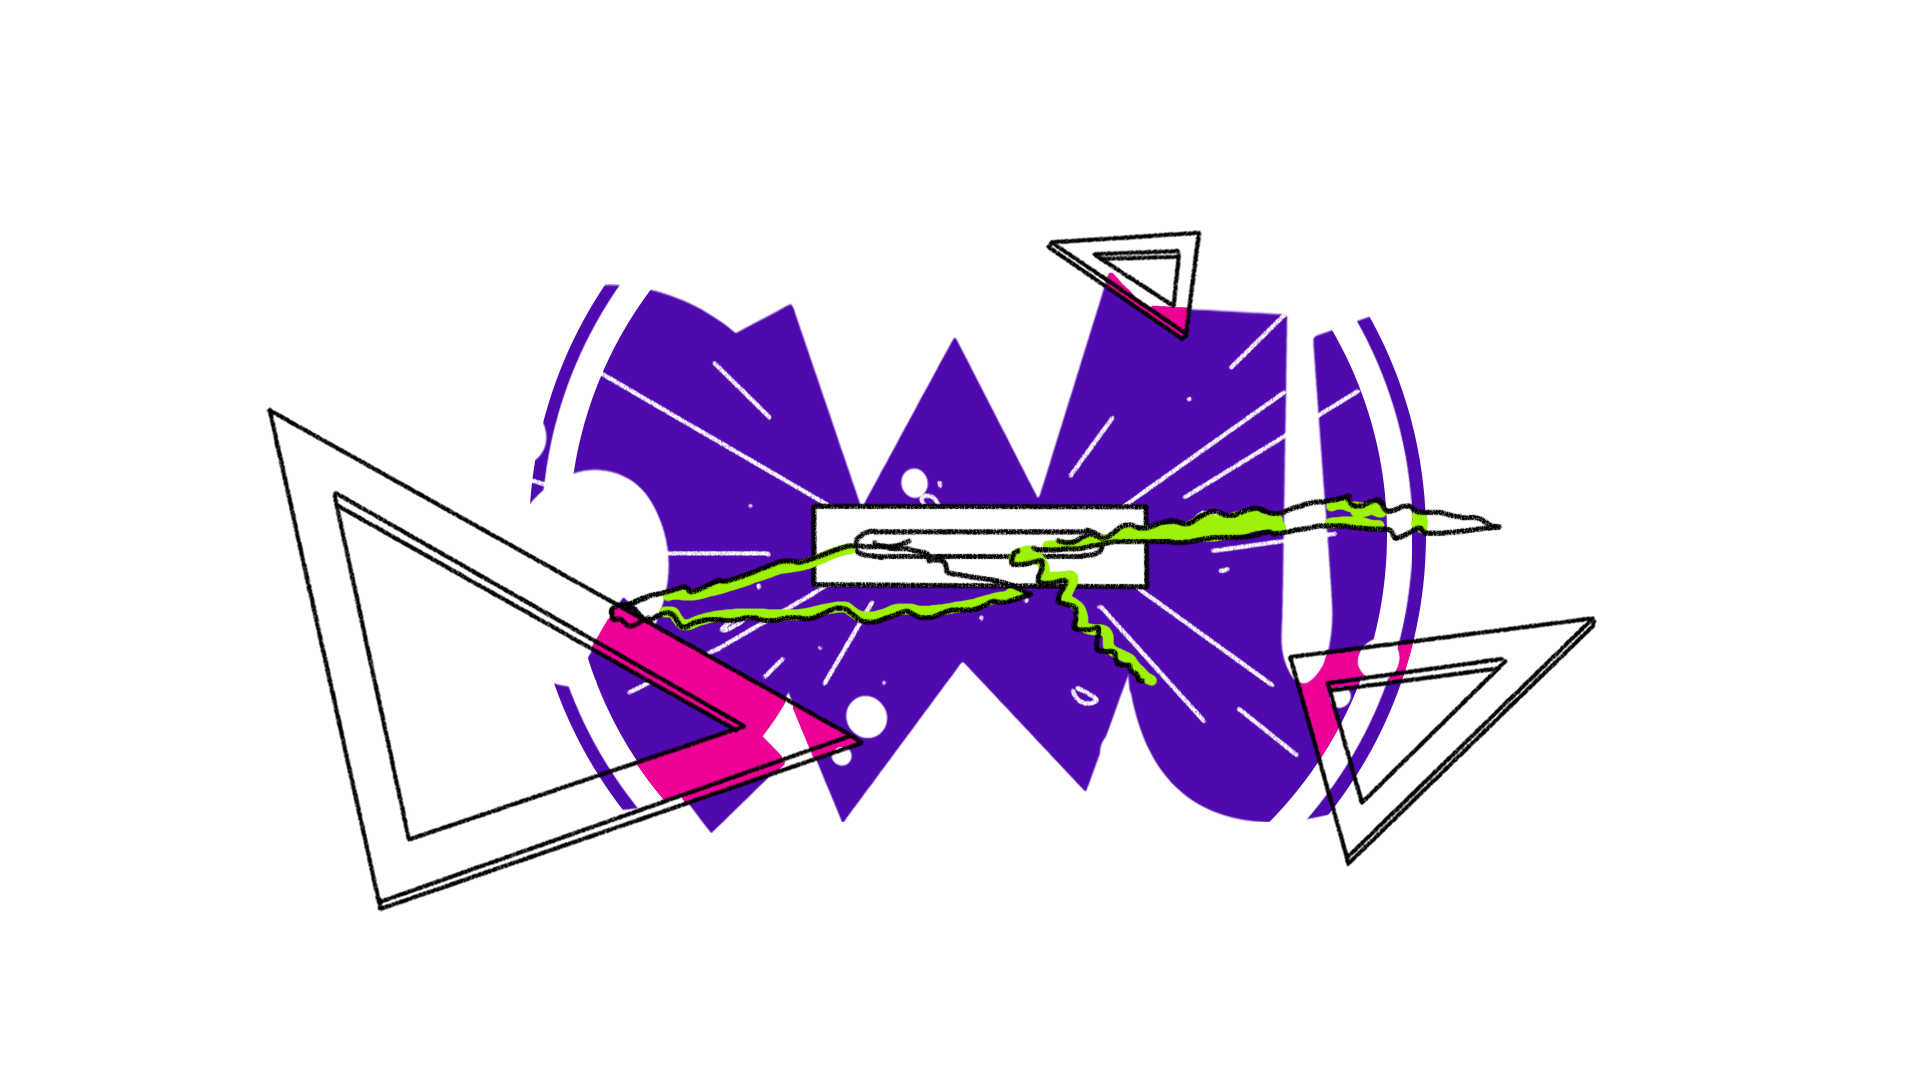 SQWUB-Storyboard-12.png